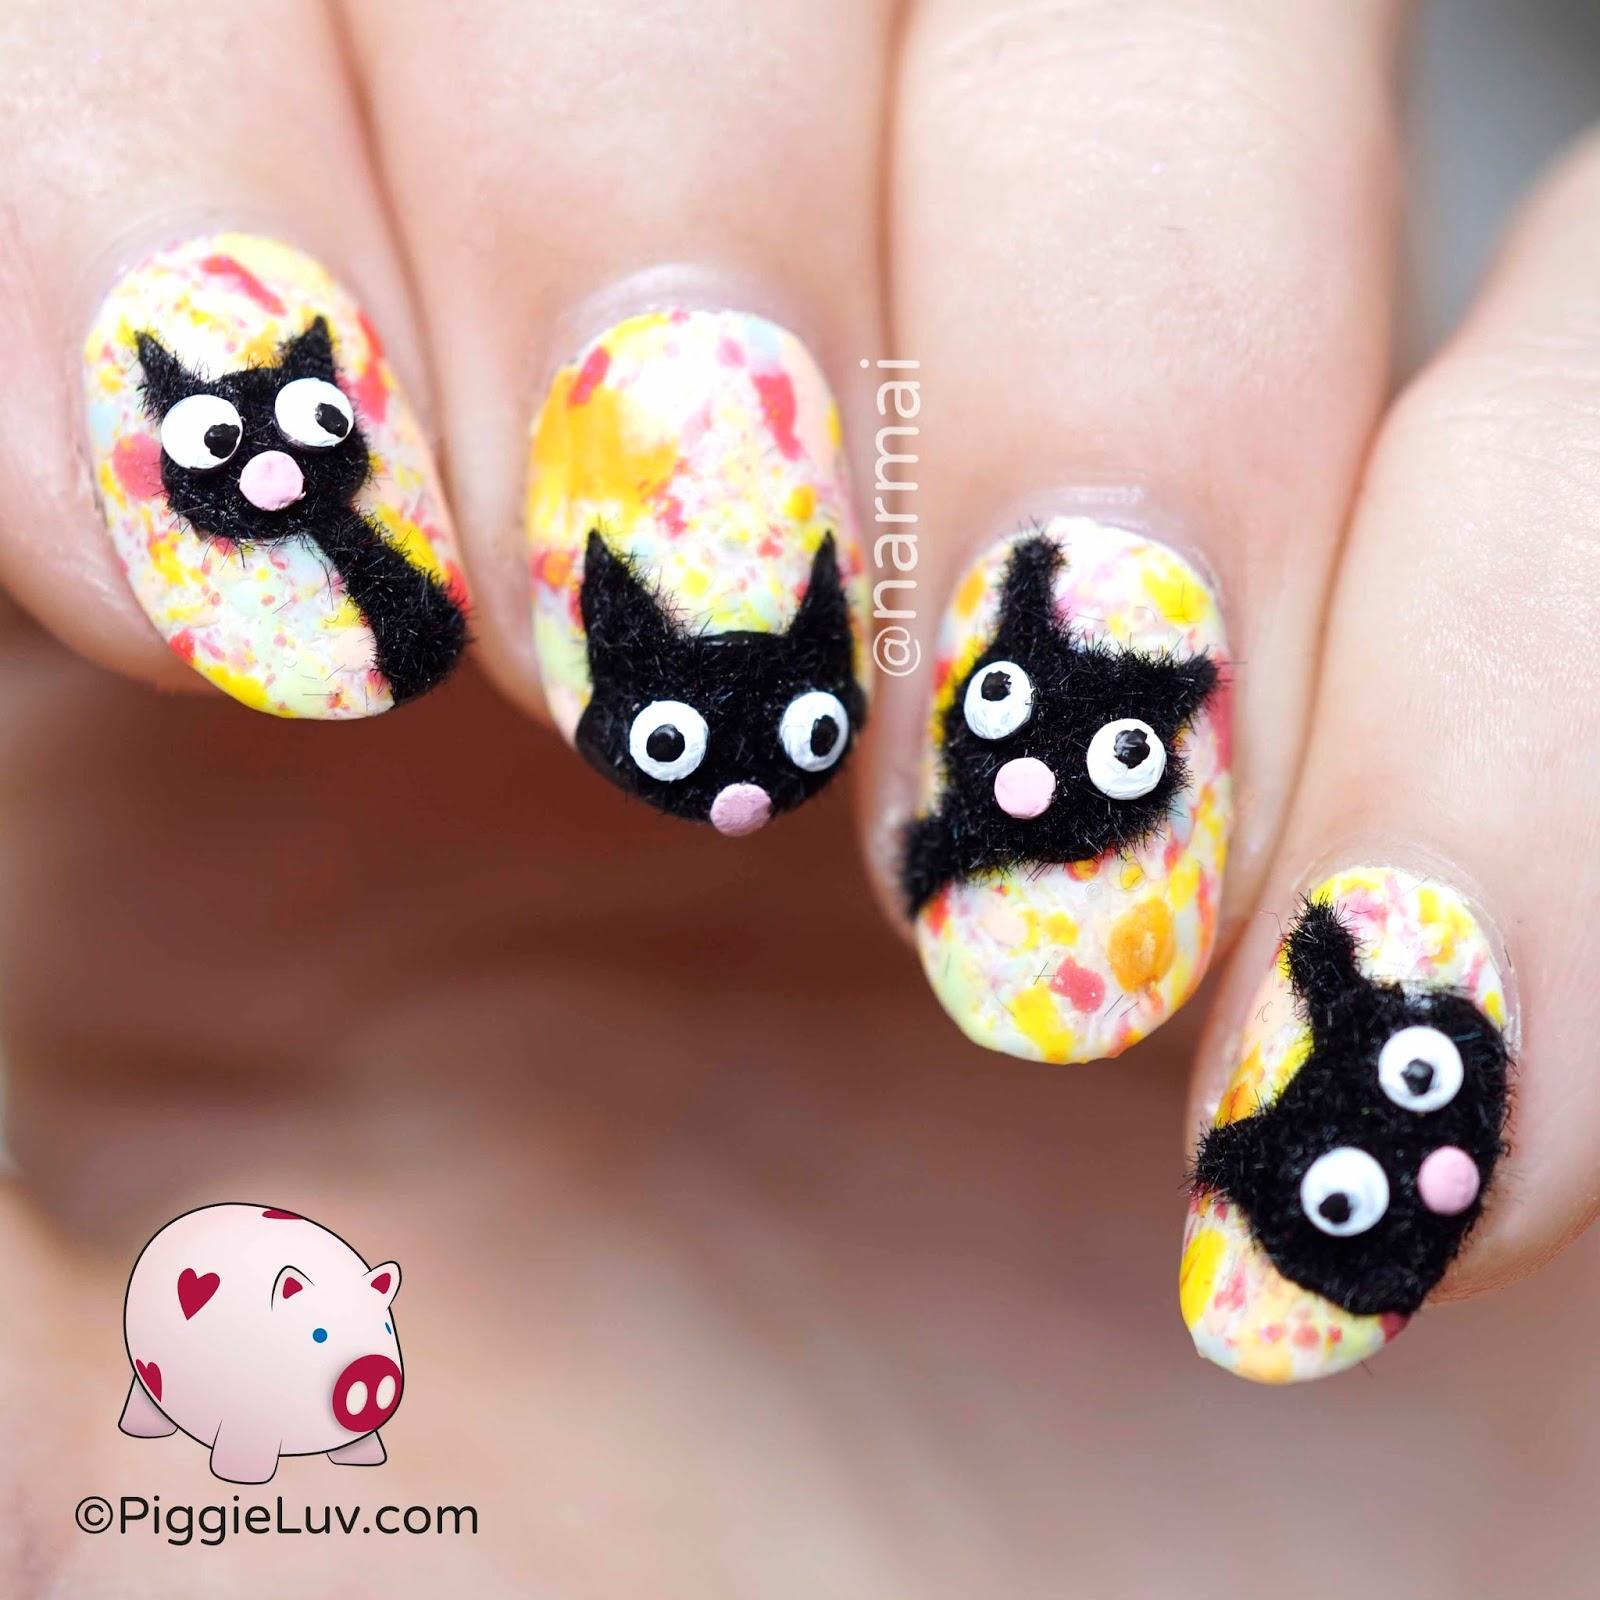 Piggieluv Fuzzy Cats Nail Art